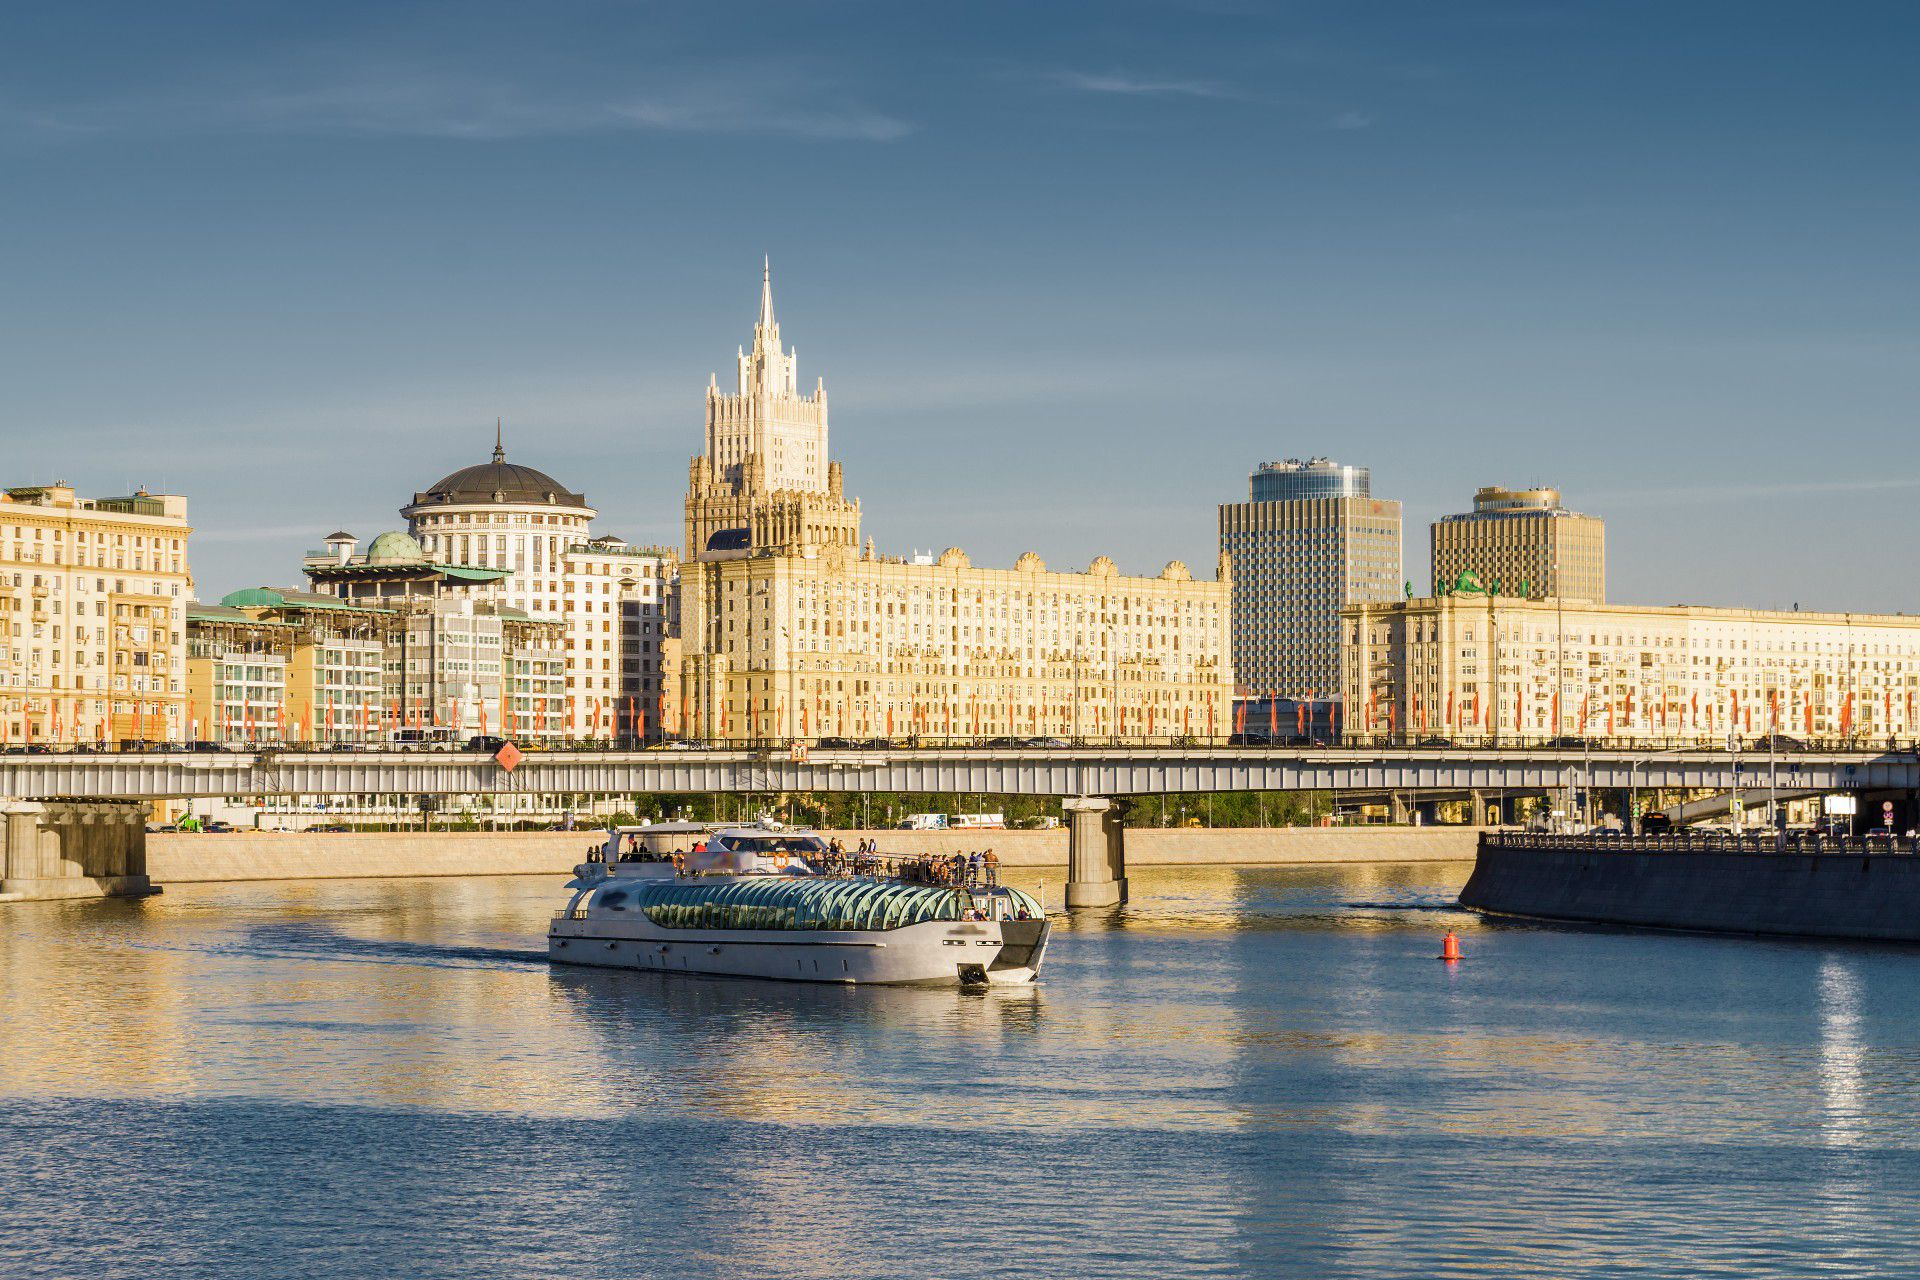 Круиз по Москве-реке на борту яхты Radisson фото 1